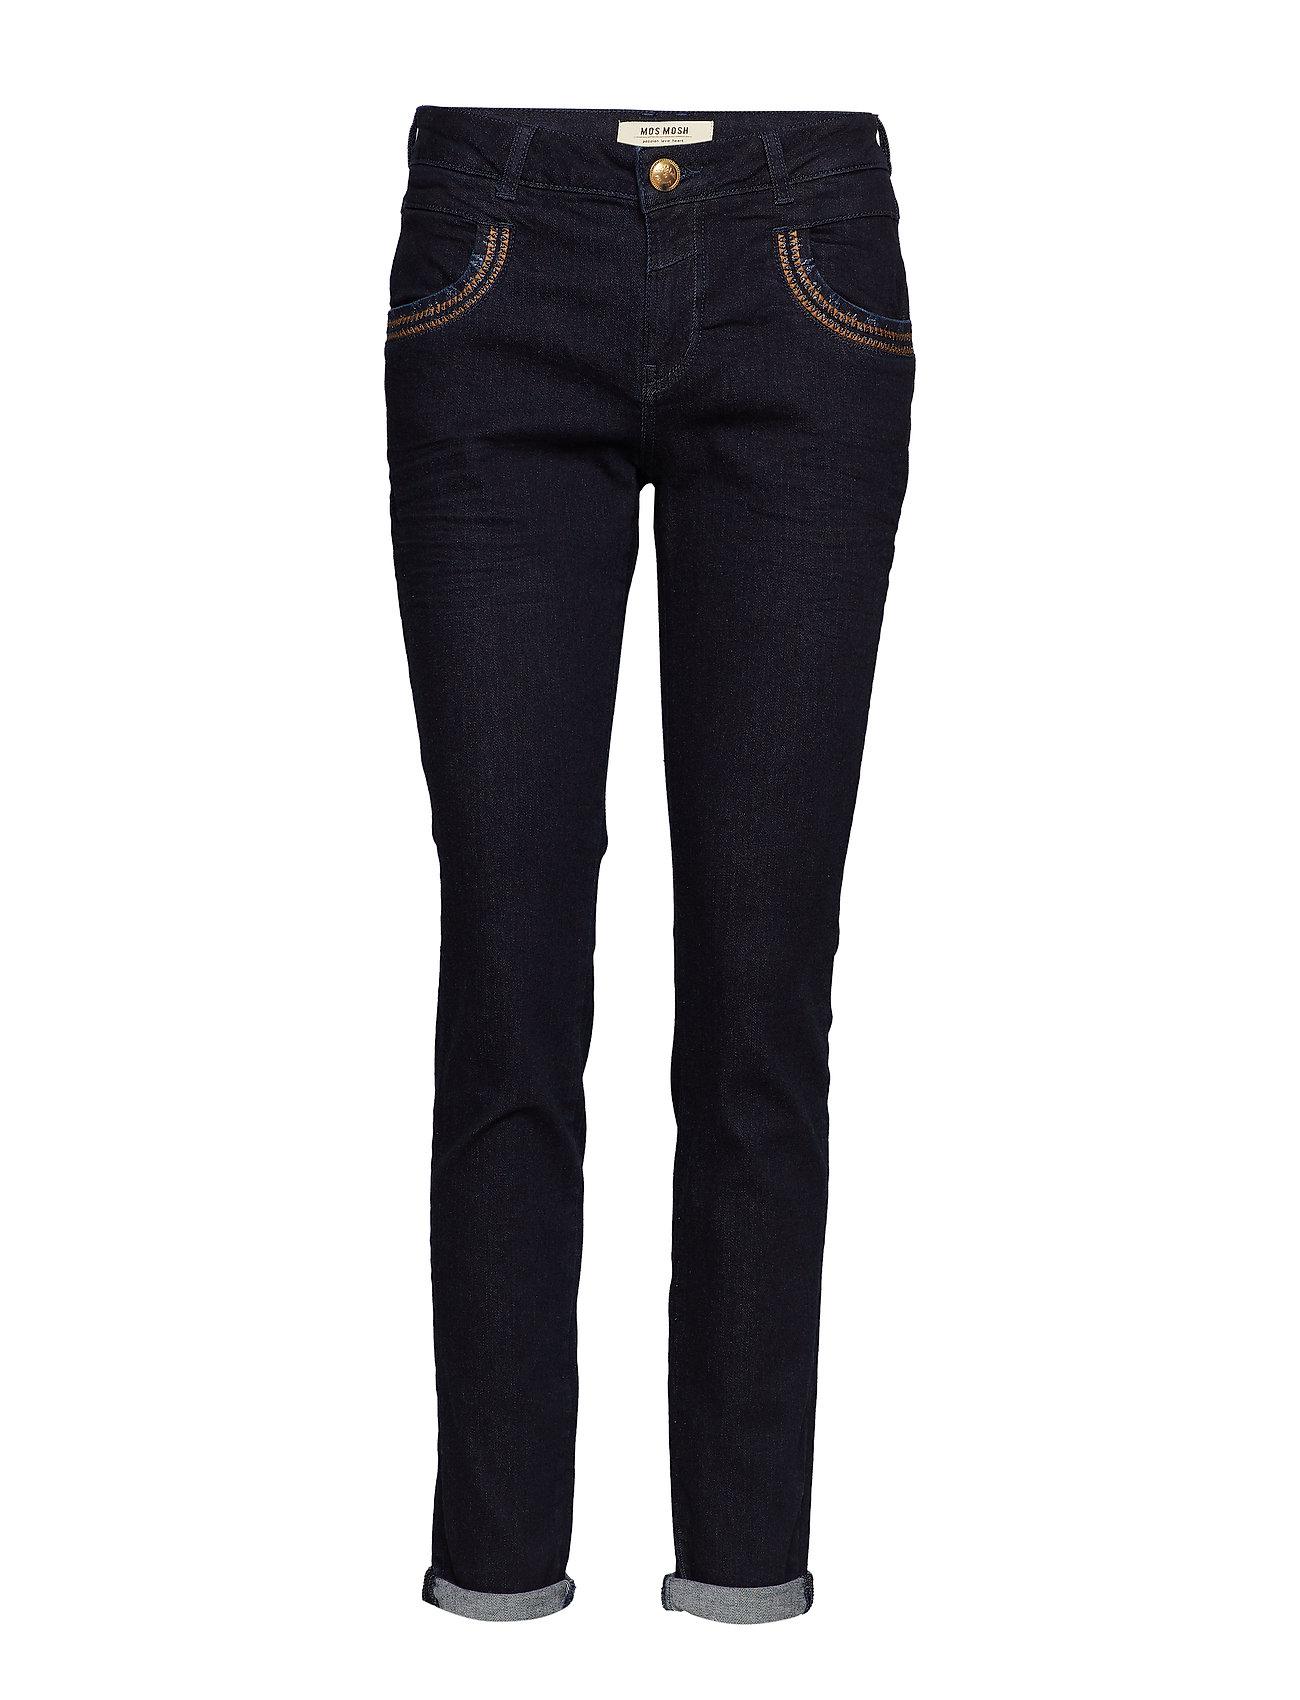 MOS MOSH Naomi Inca Jeans